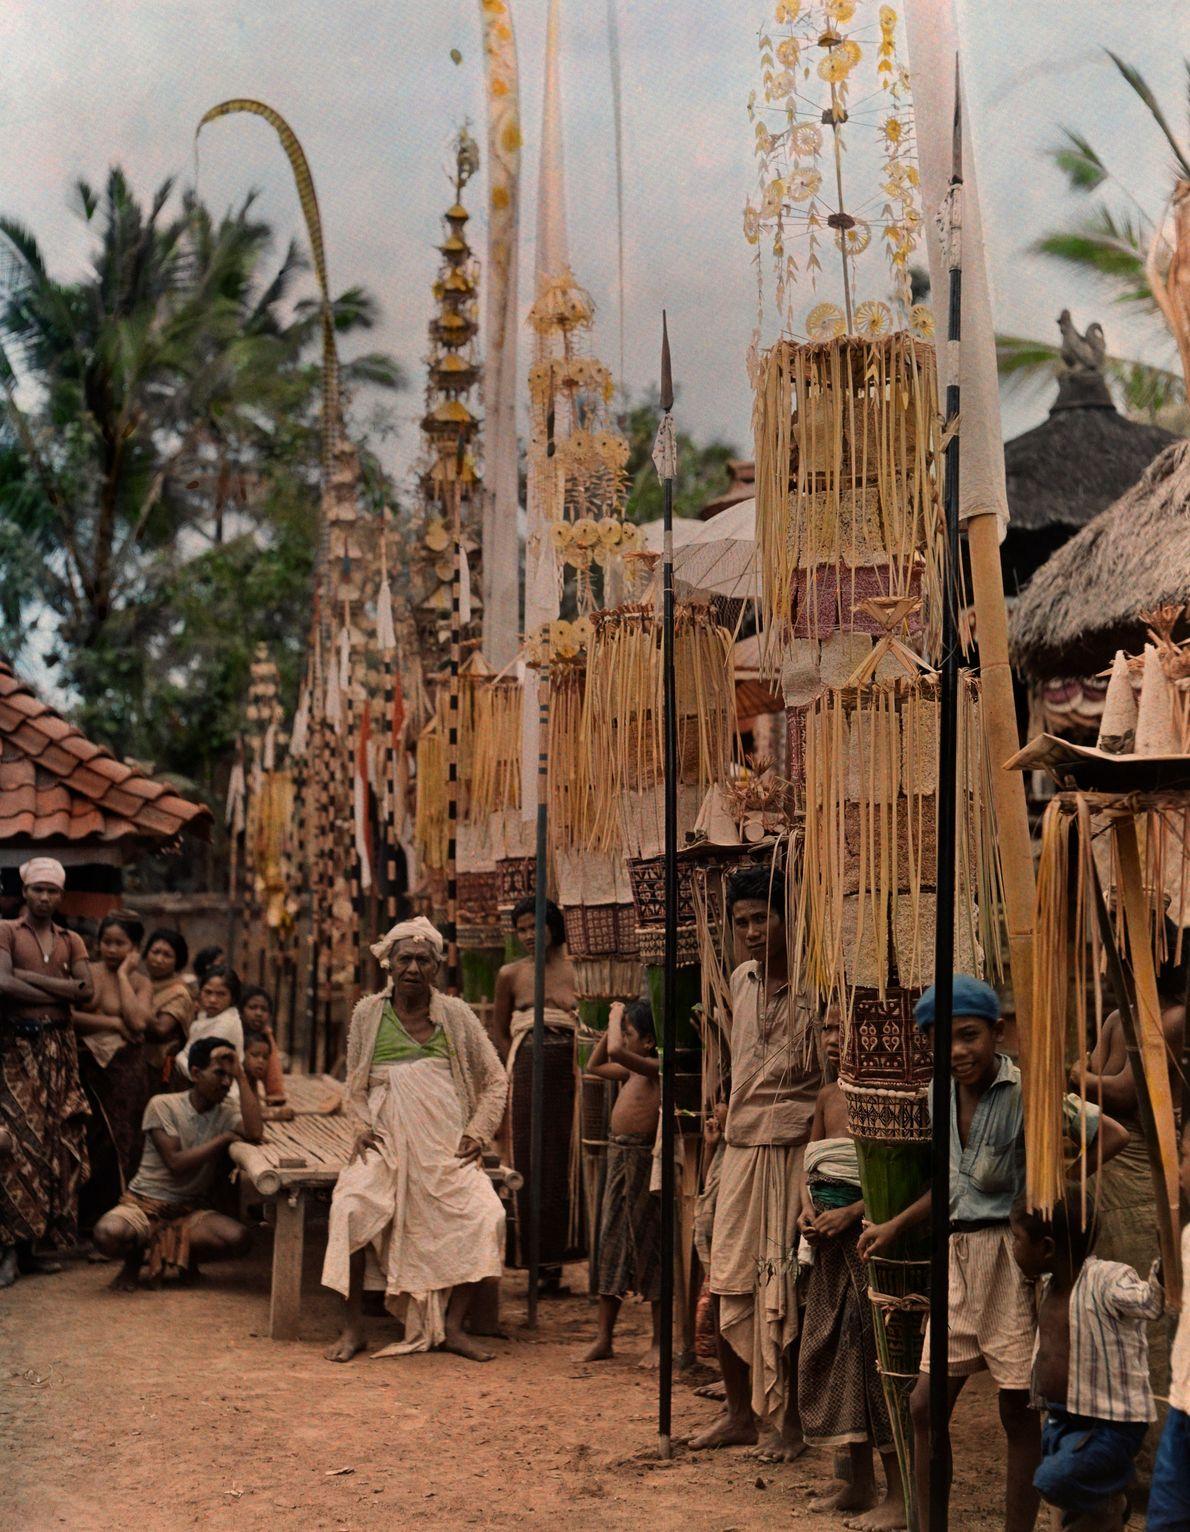 Bali, Indonesia: 1927